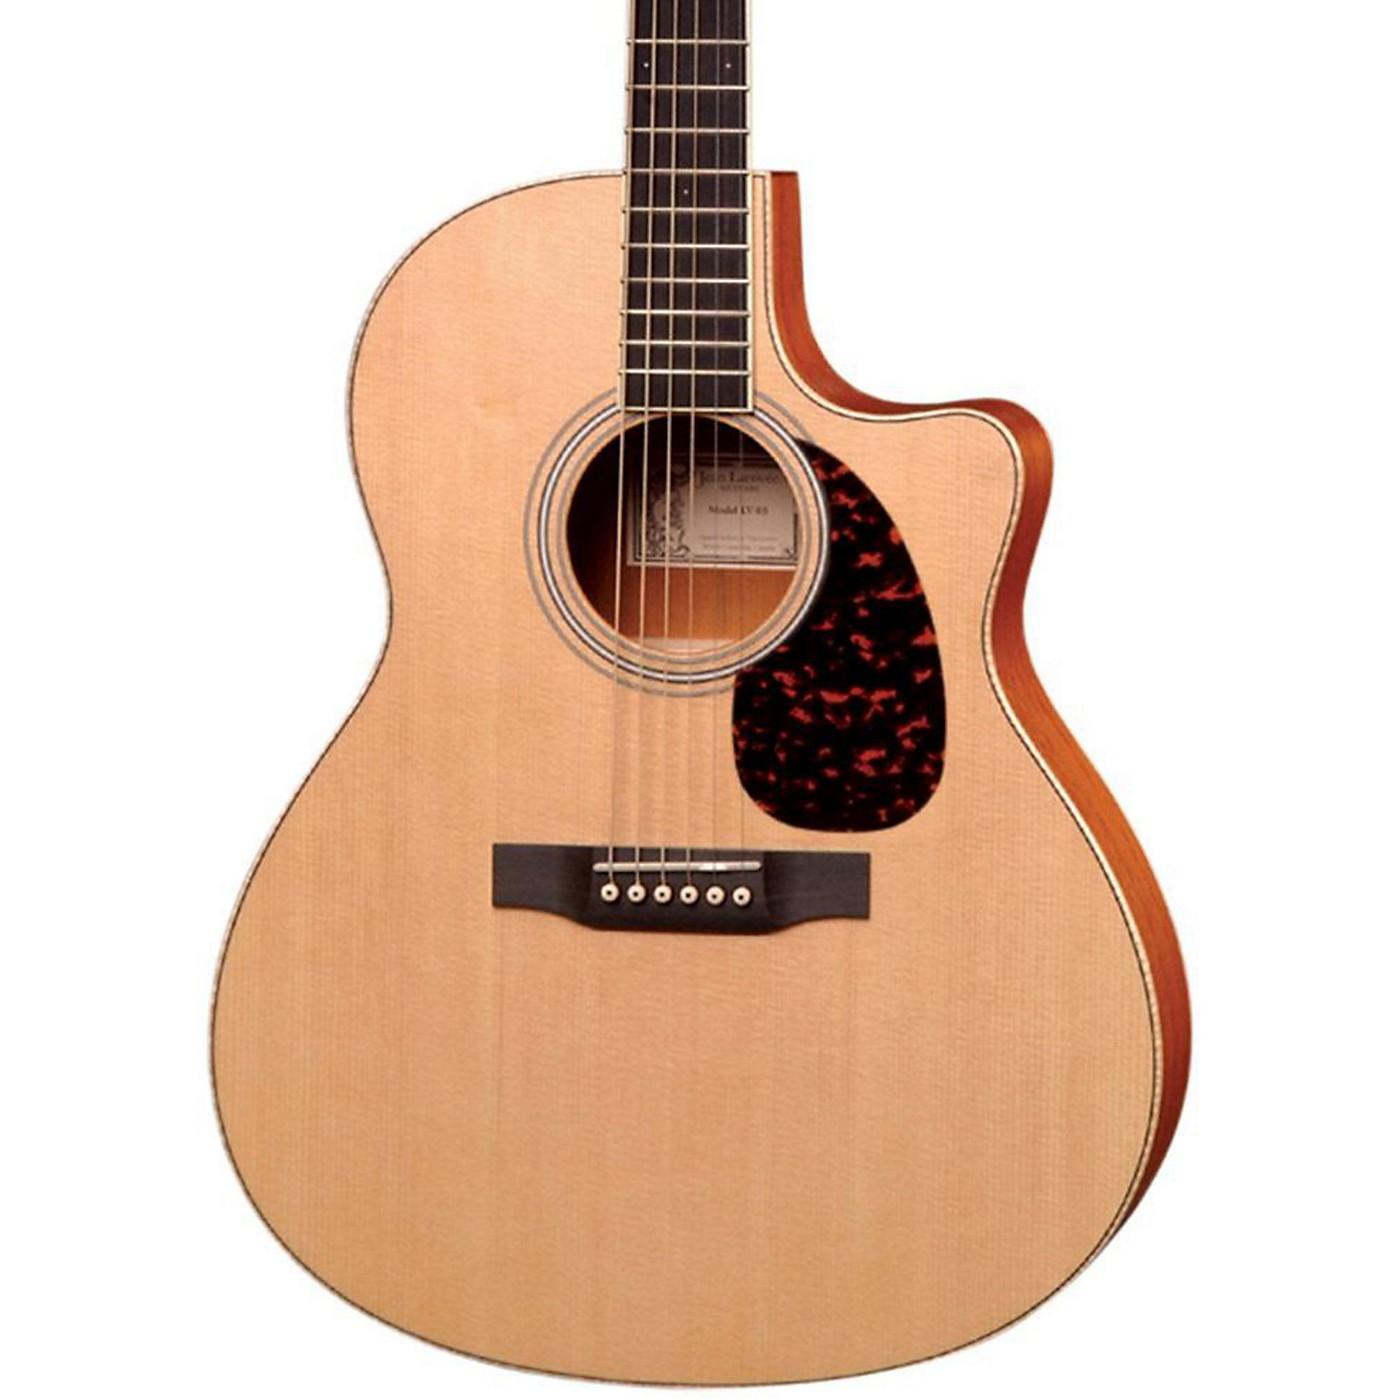 Larrivee LV-03E Mahogany Standard Series Cutaway Acoustic-Electric Guitar thumbnail